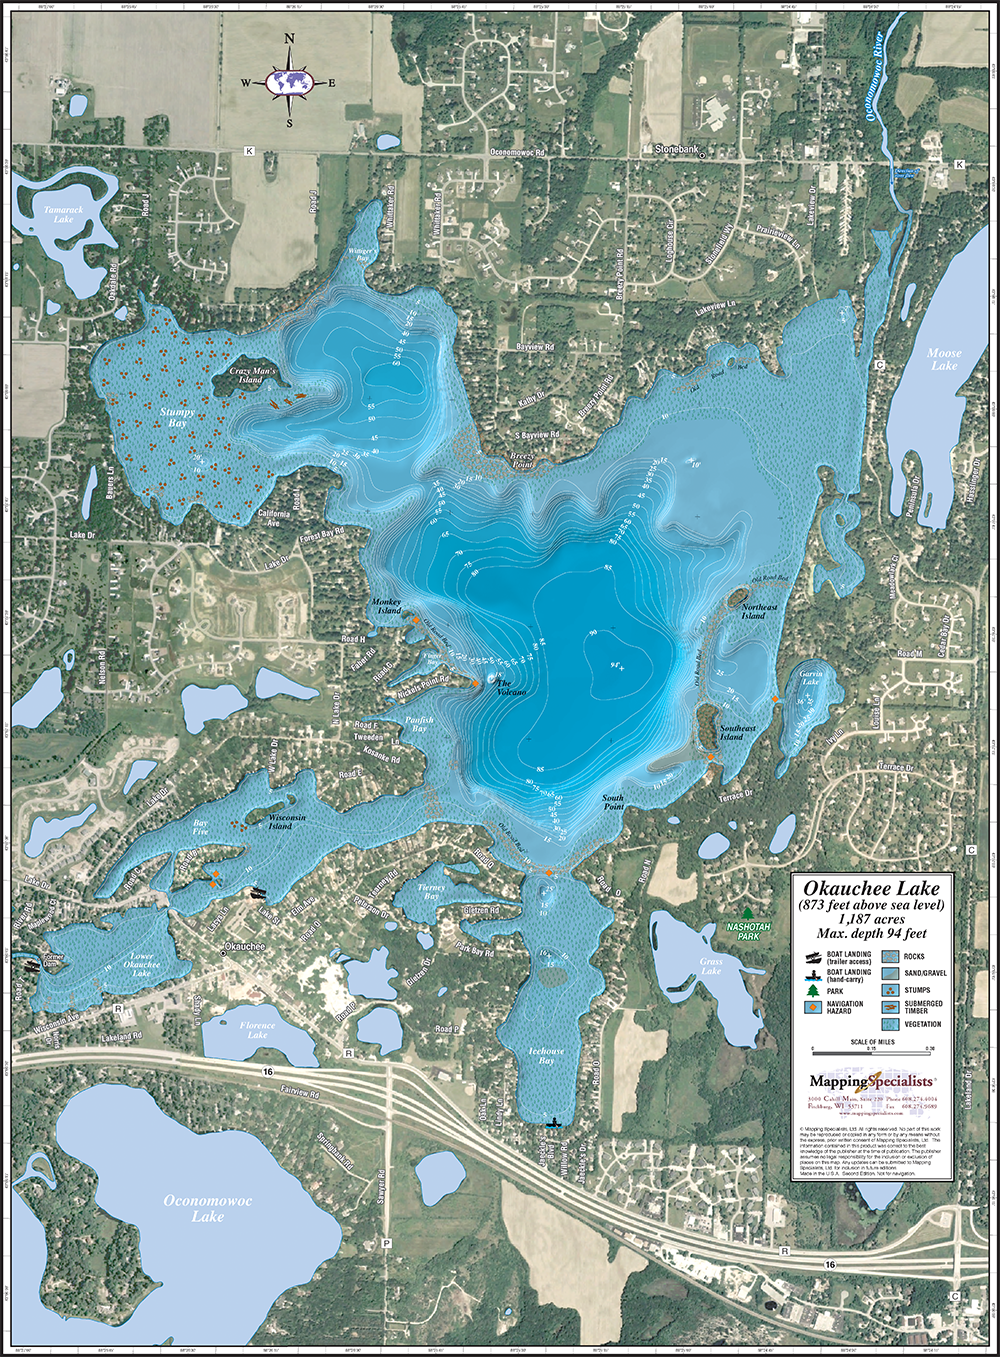 Okauchee Lake Enhanced Wall Map Okauchee Lake Wall Maps Lake